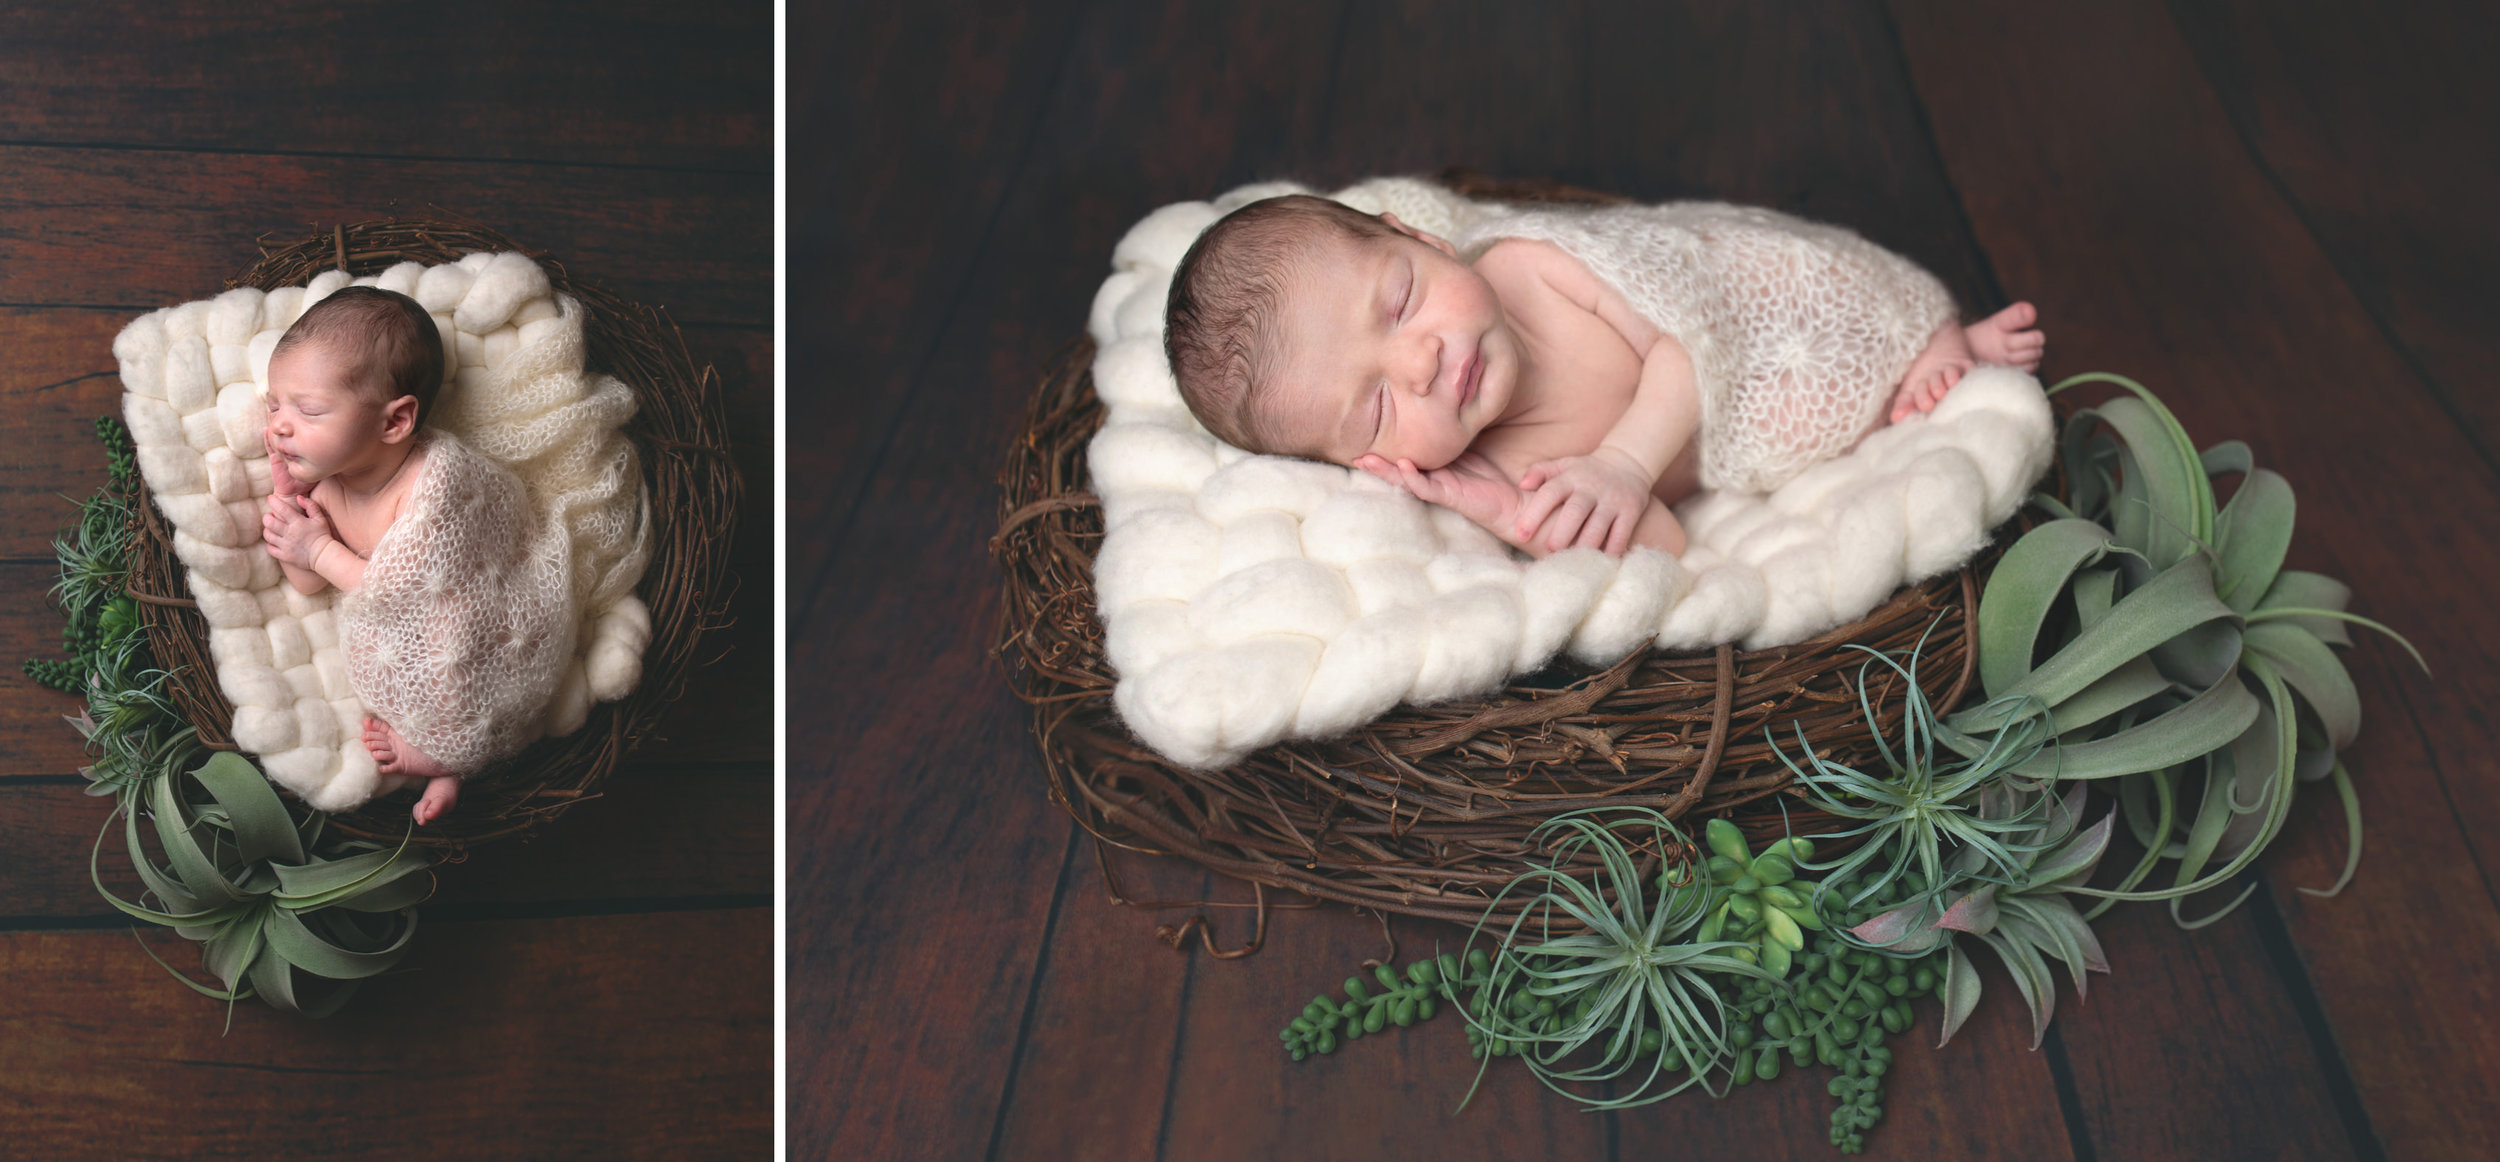 Ebensburg Altoona Pa newborn baby Cresson photographer_ Emery succulents (3).jpg